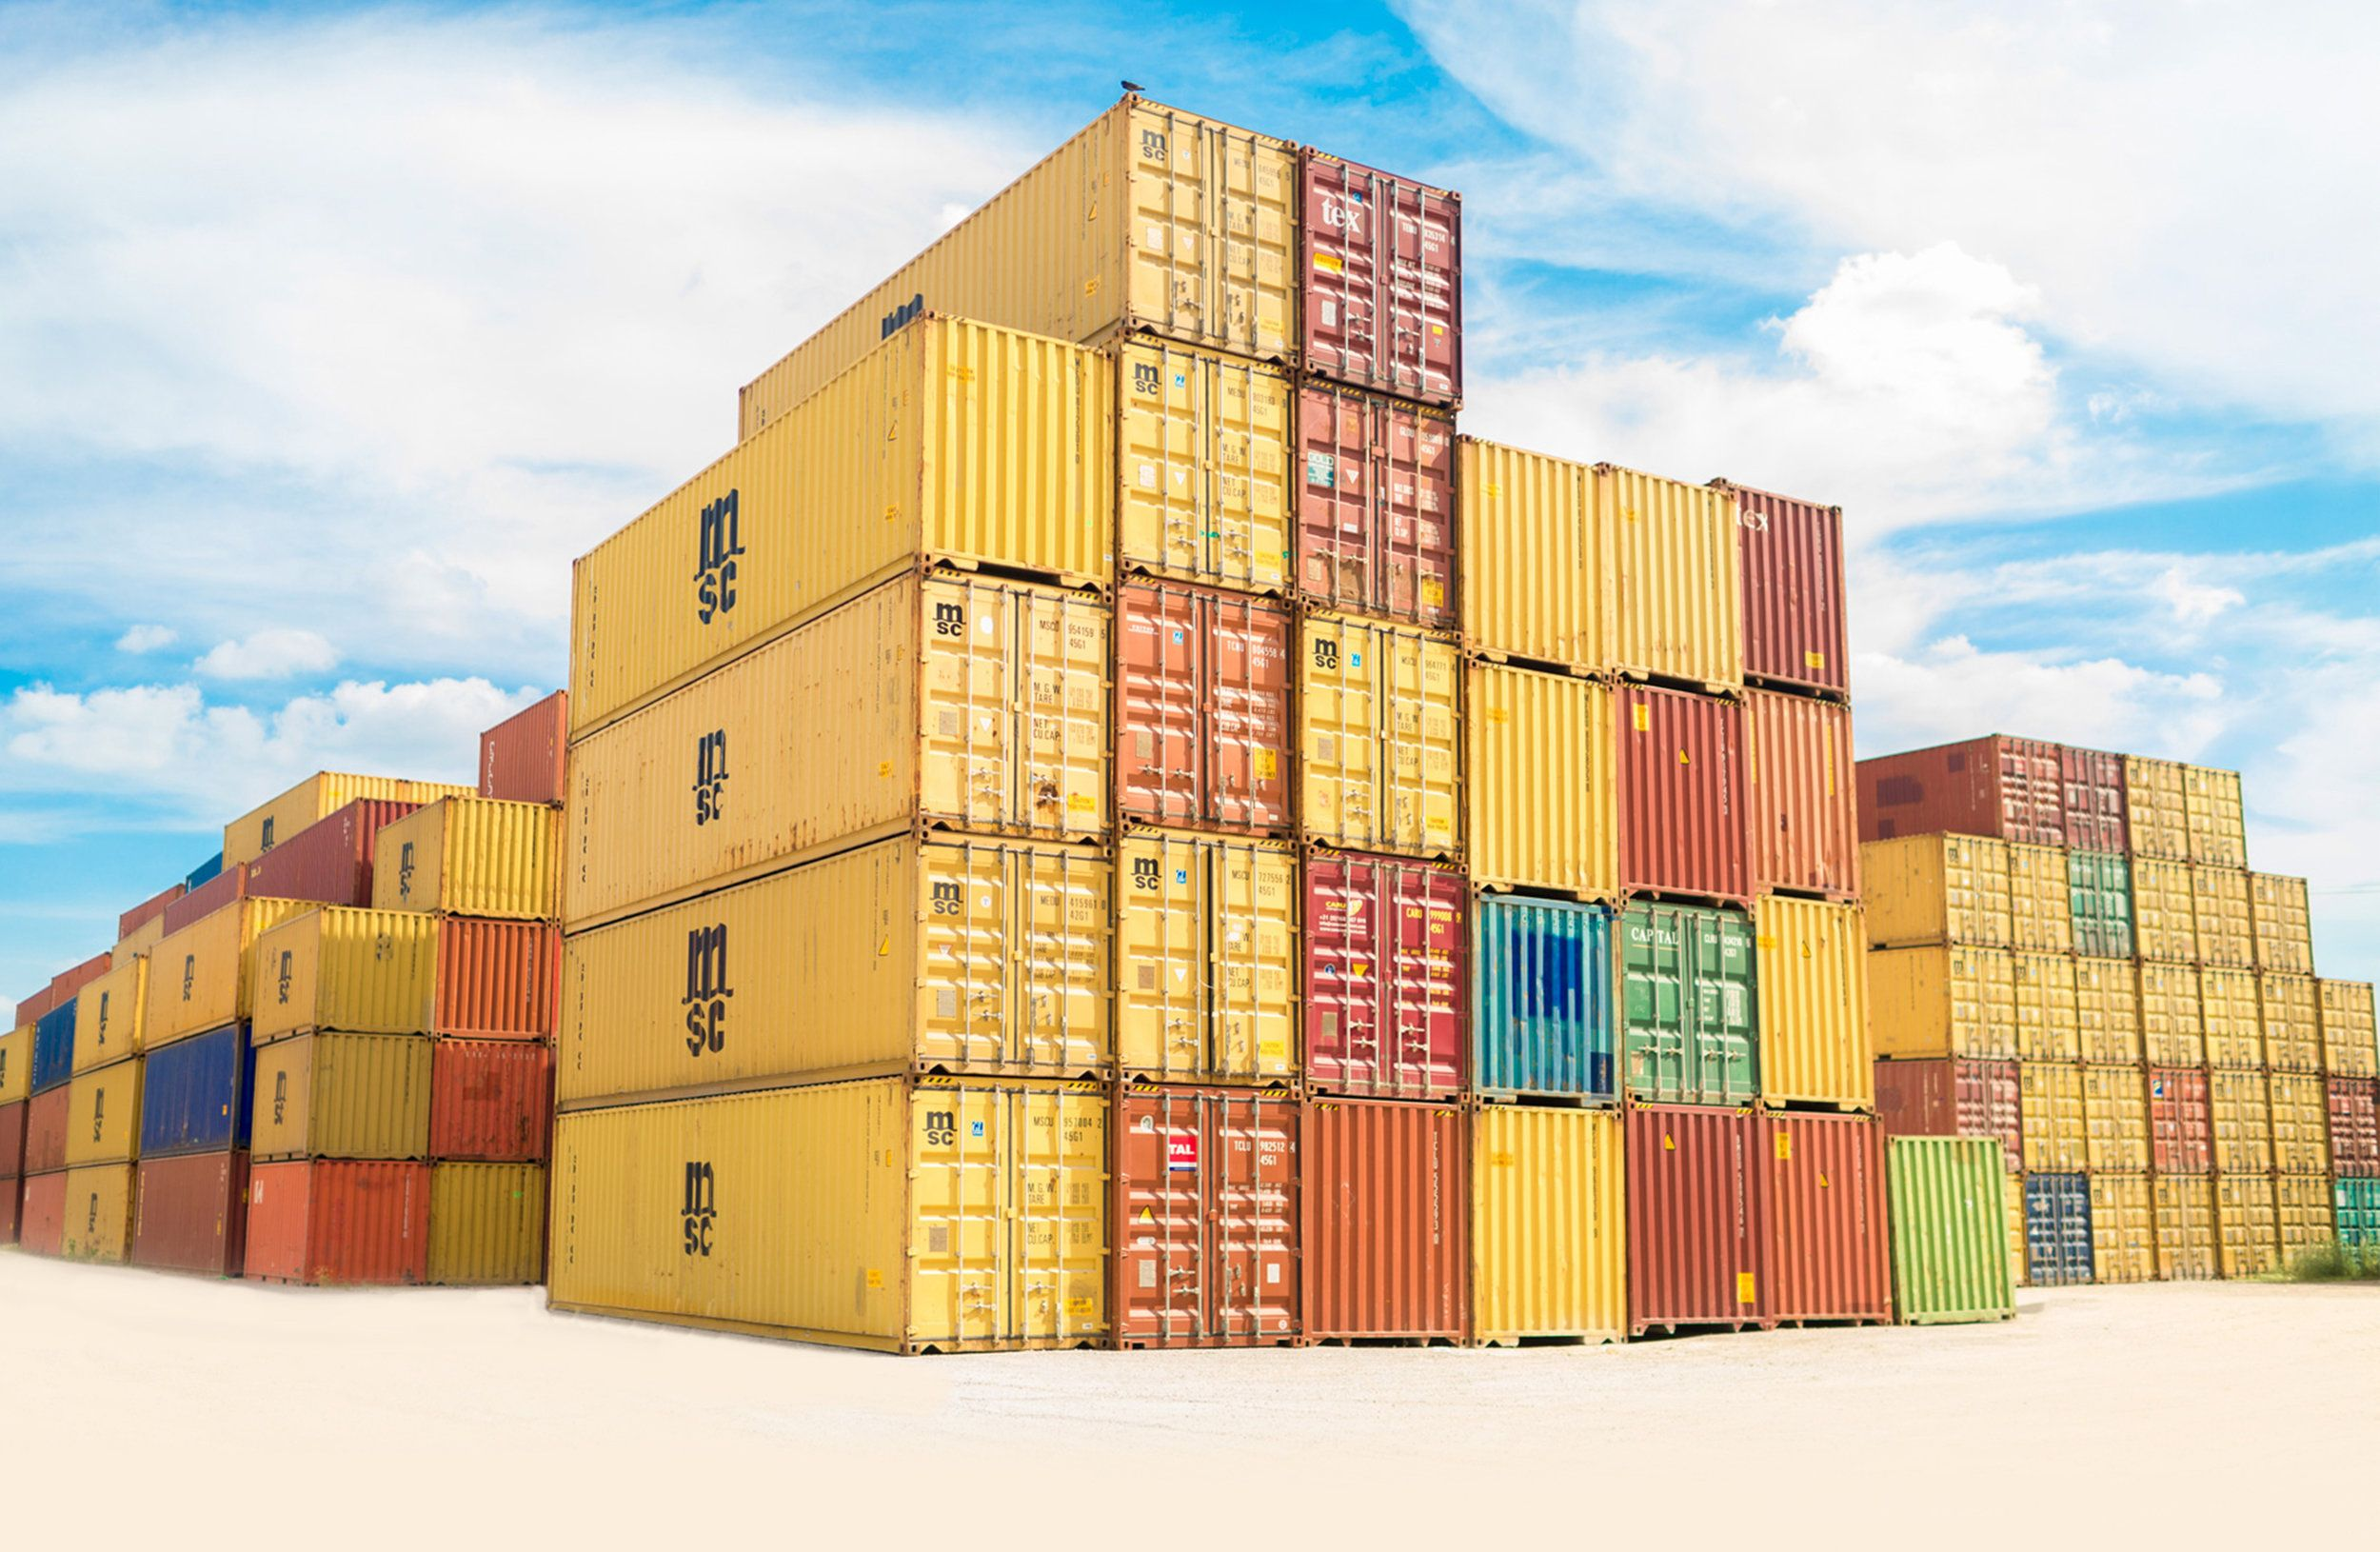 How Storage Units Are Impacting Urban Design Storage